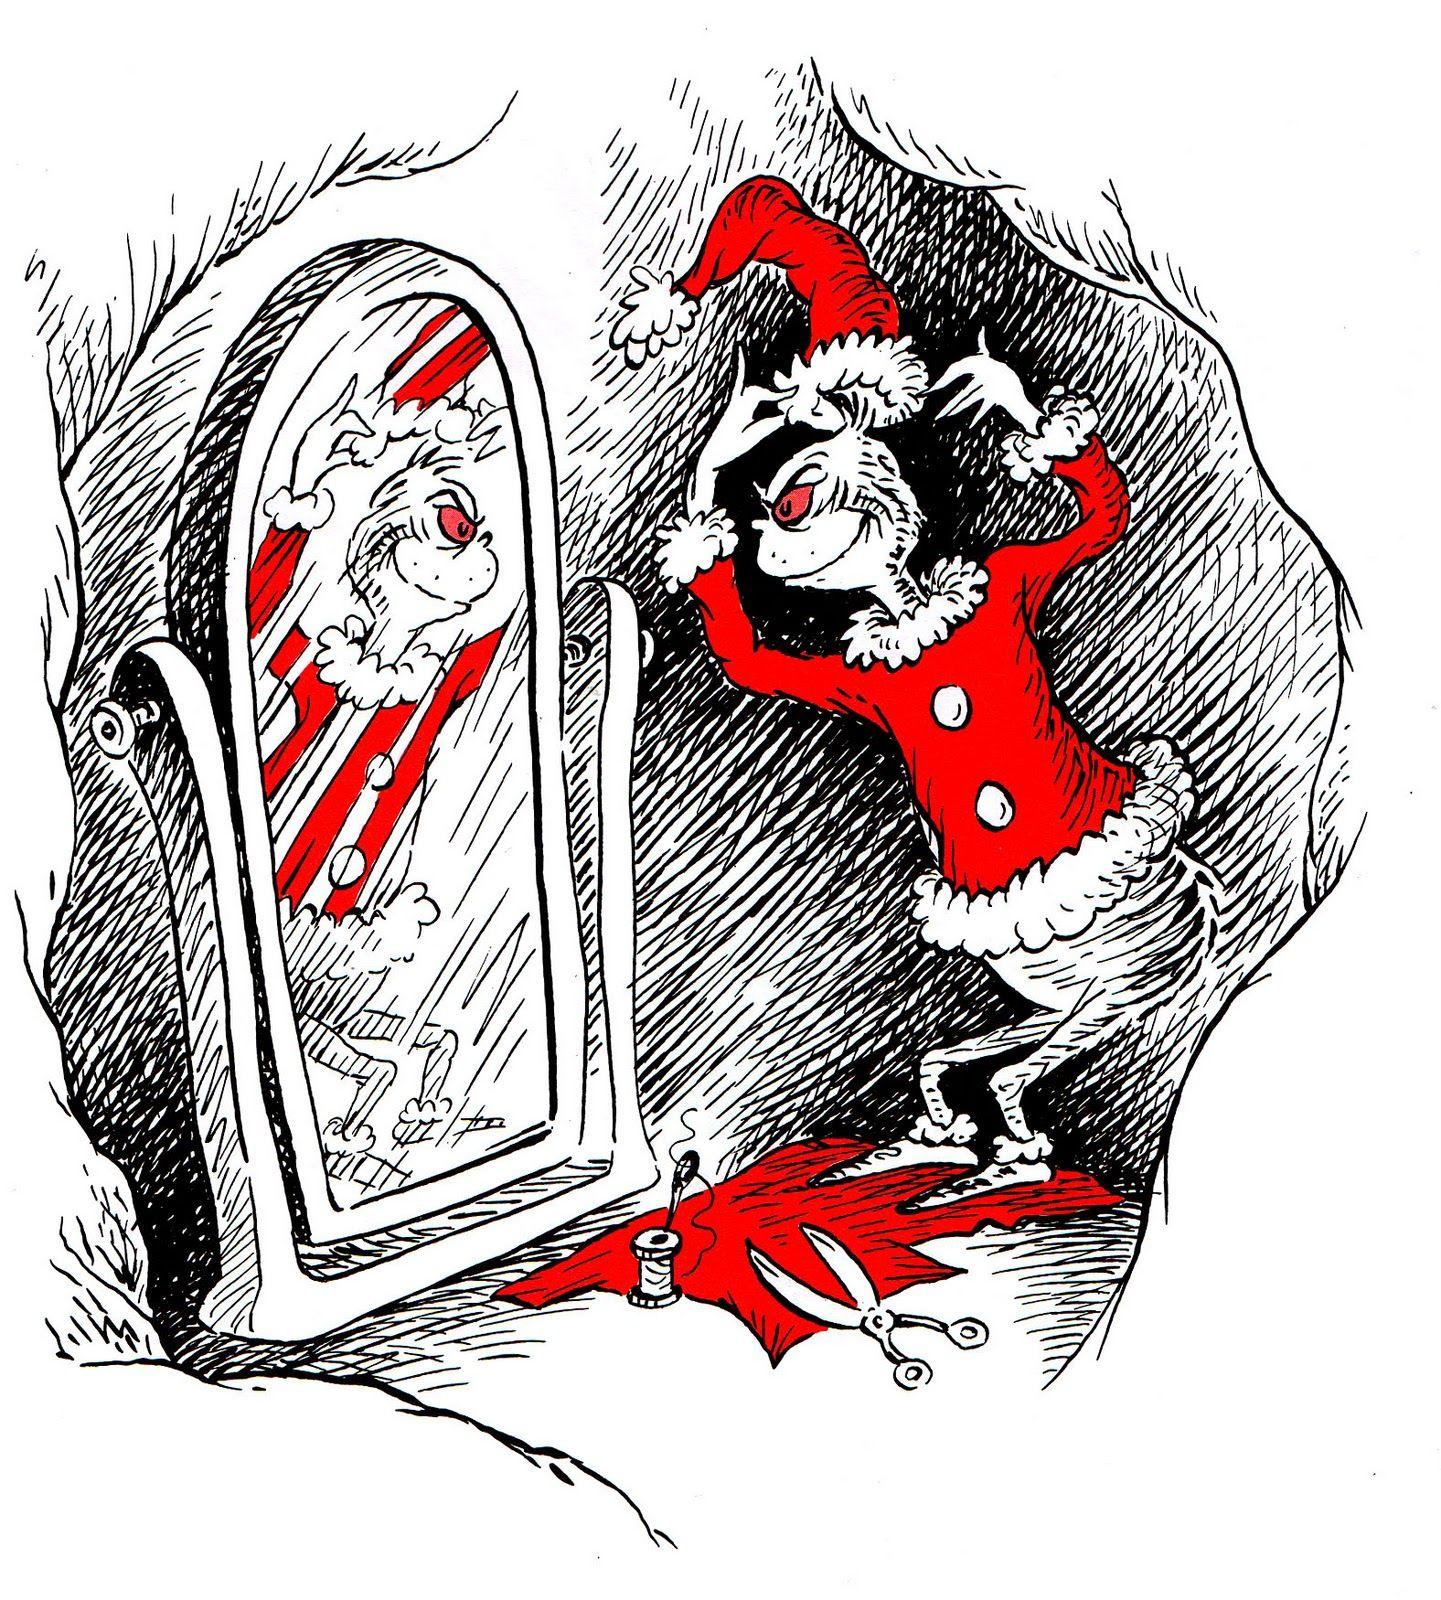 How The Grinch Stole Christmas Book Illustrations.How The Grinch Stole Christmas Illustration Theodor Geisel